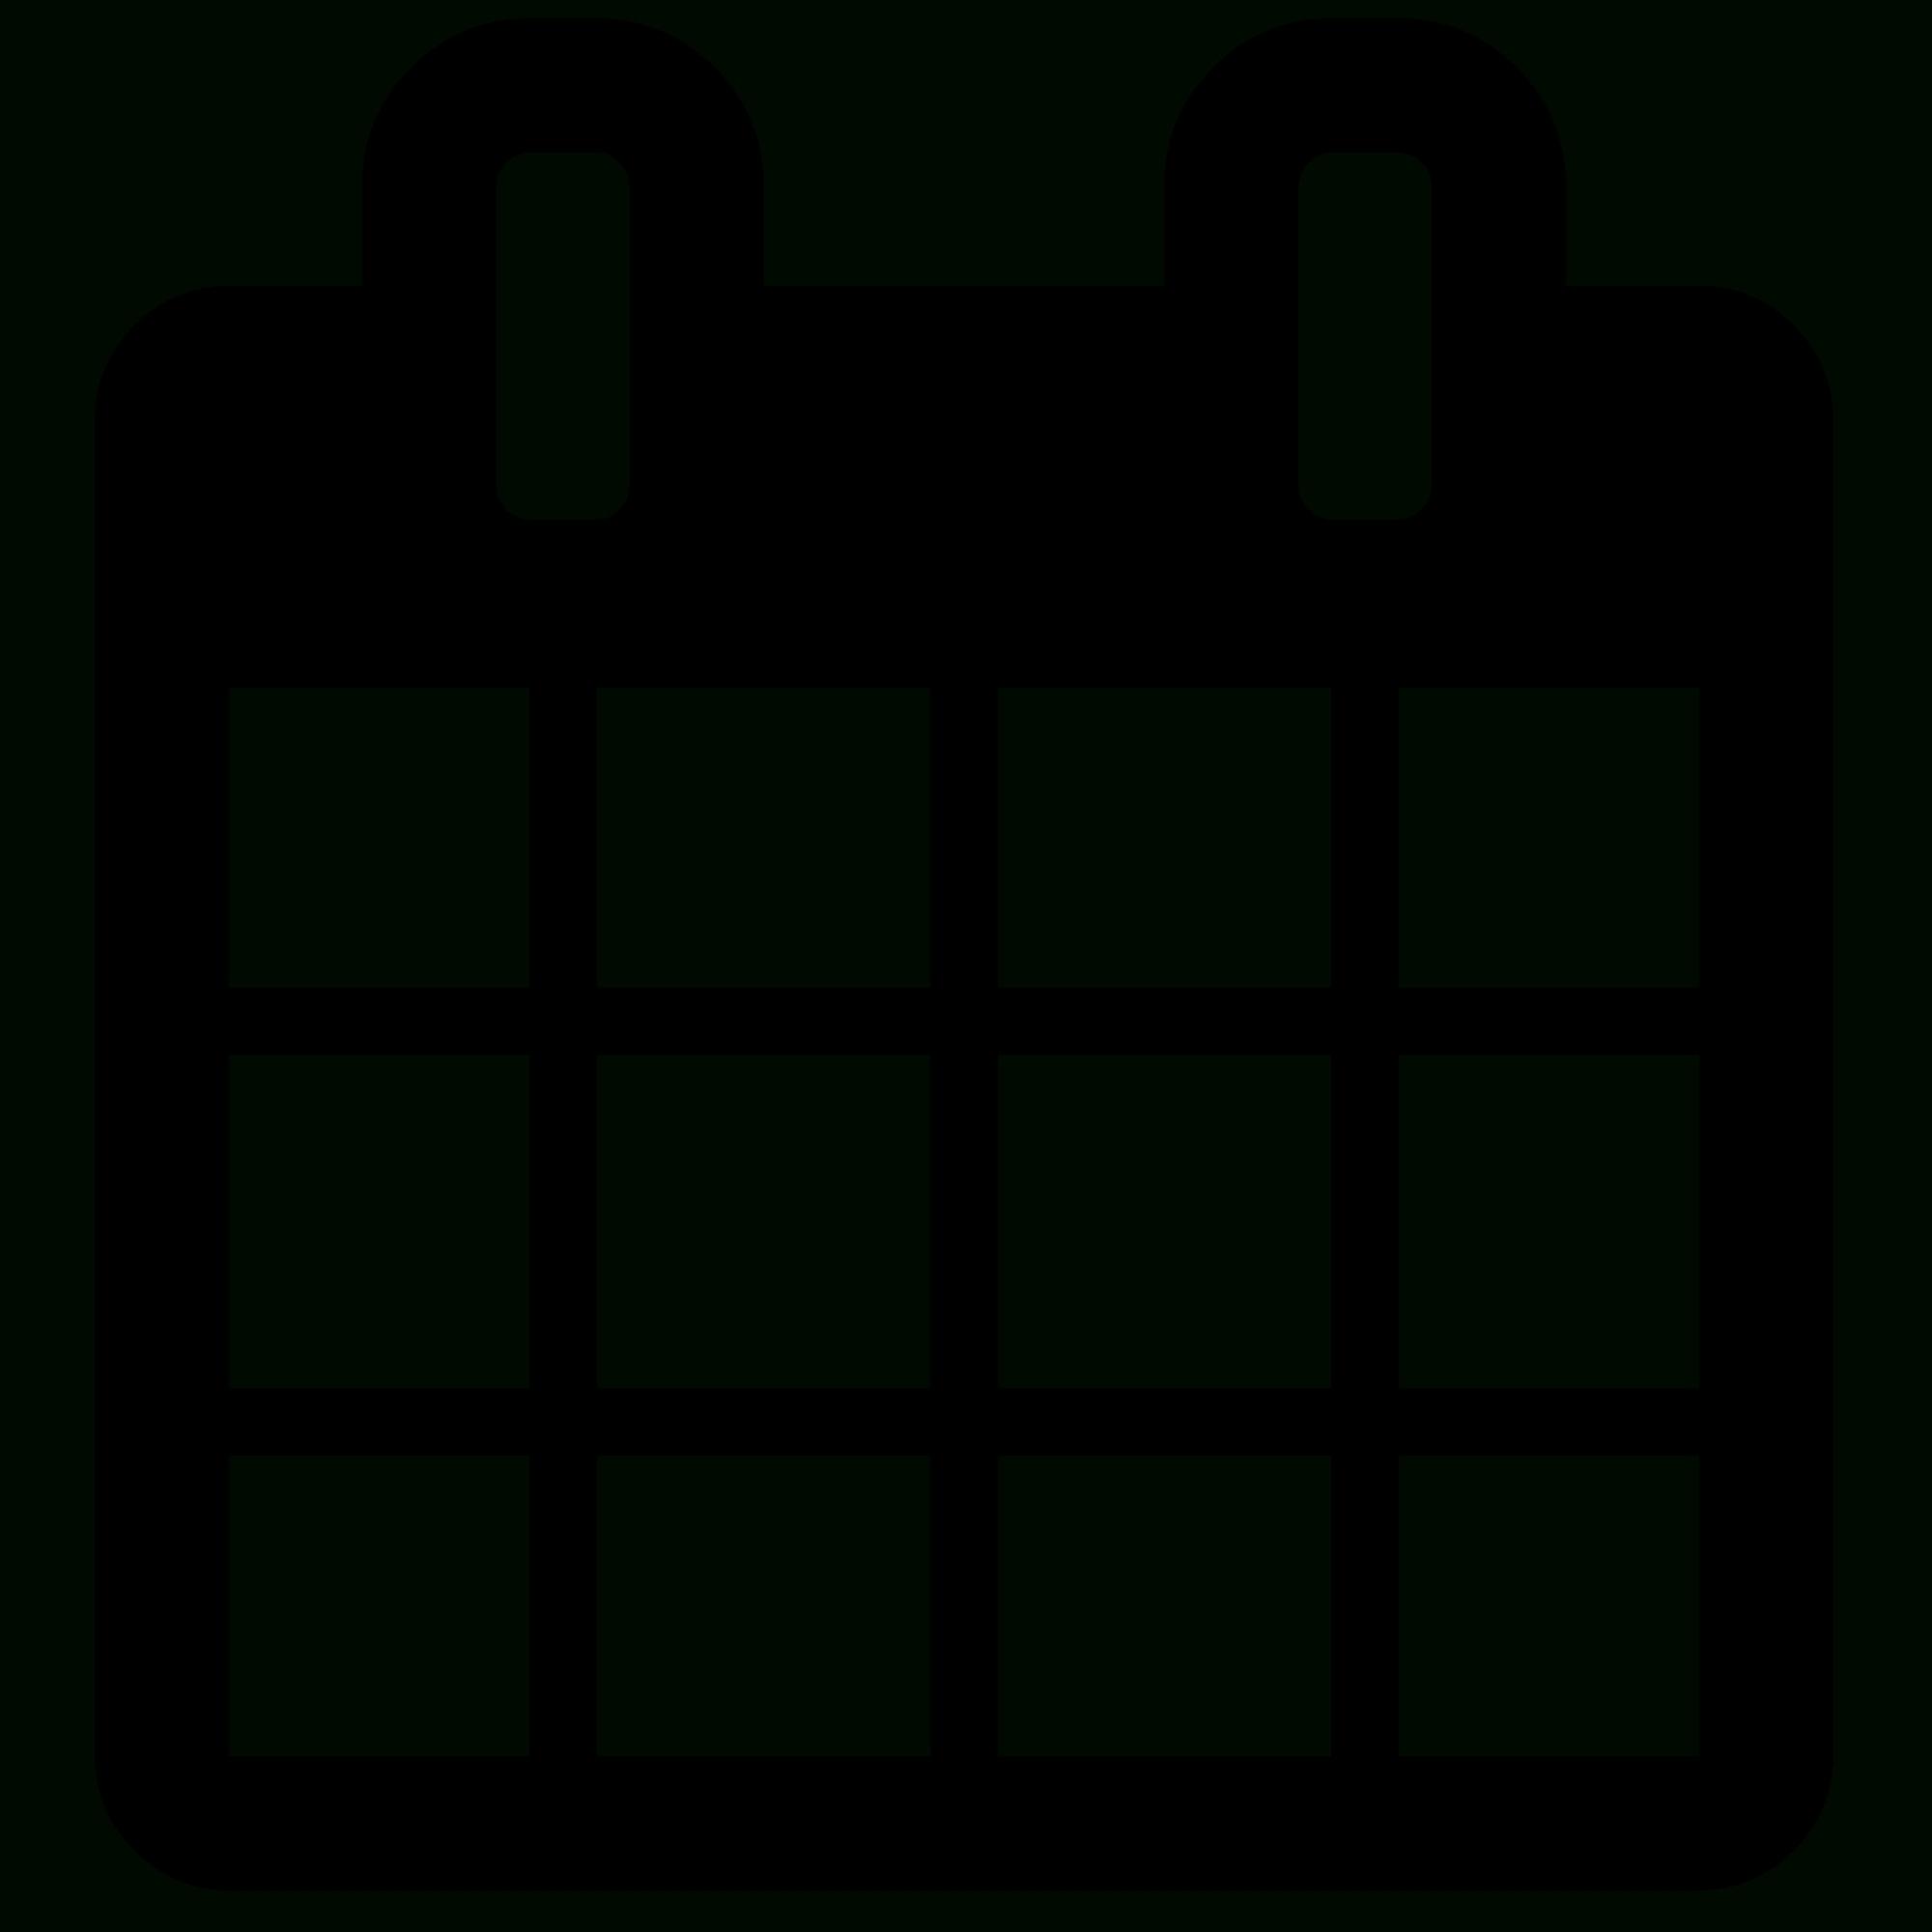 Delft School Calendar 2020 - Calendar Inspiration Design throughout Tu Delft Calendar 2019 2020